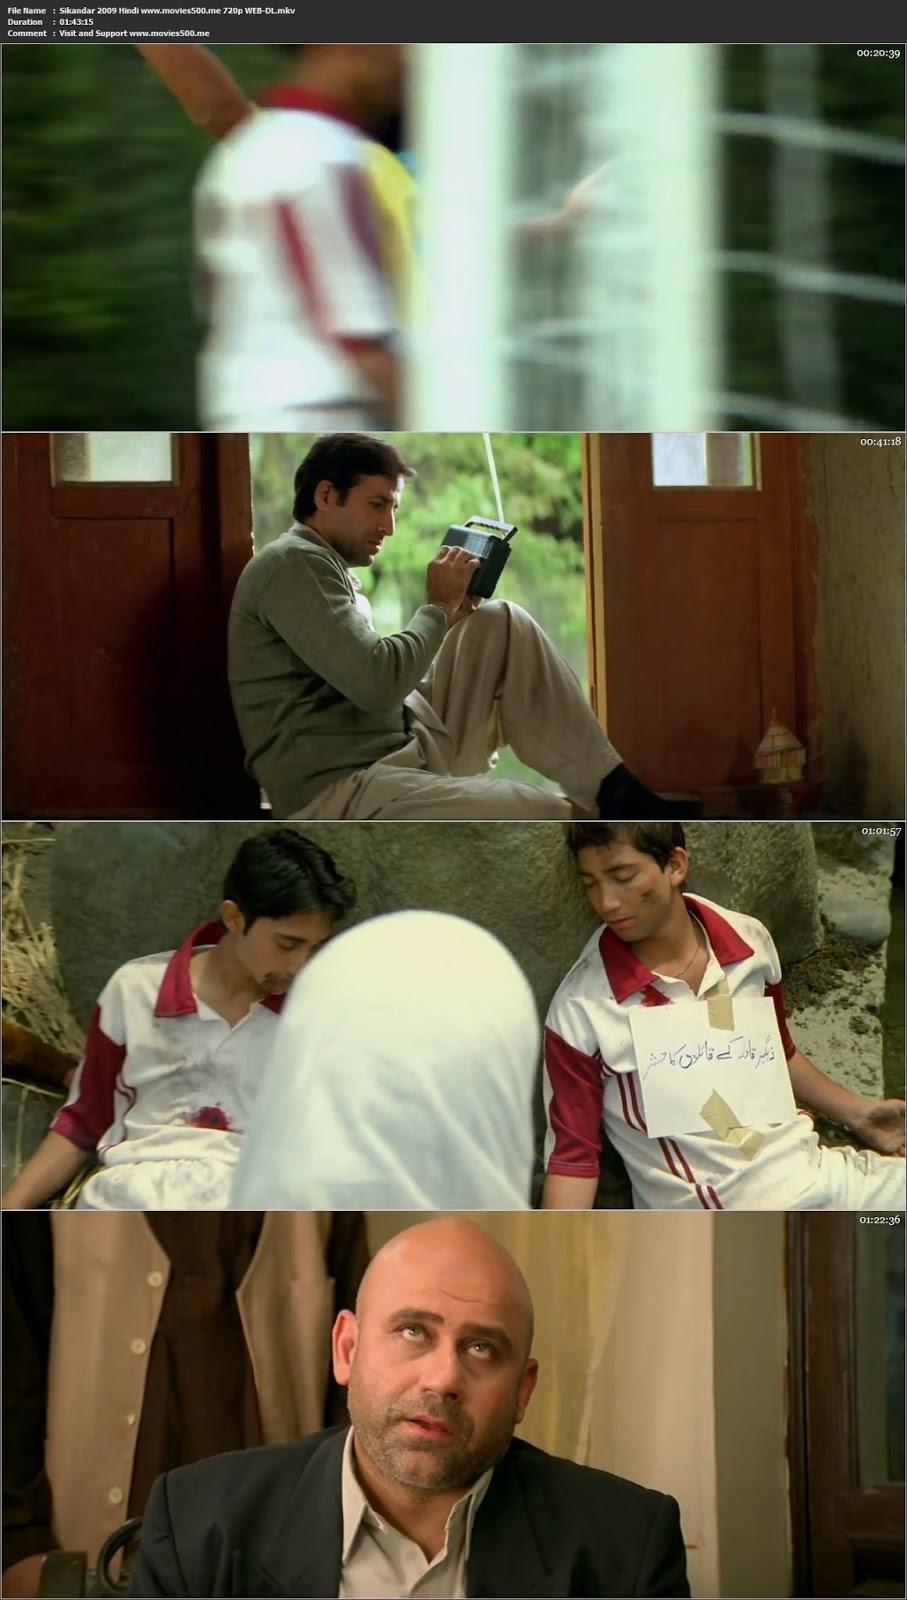 Sikandar 2009 Hindi Full Movie 700MB WEB DL 720p at newbtcbank.com